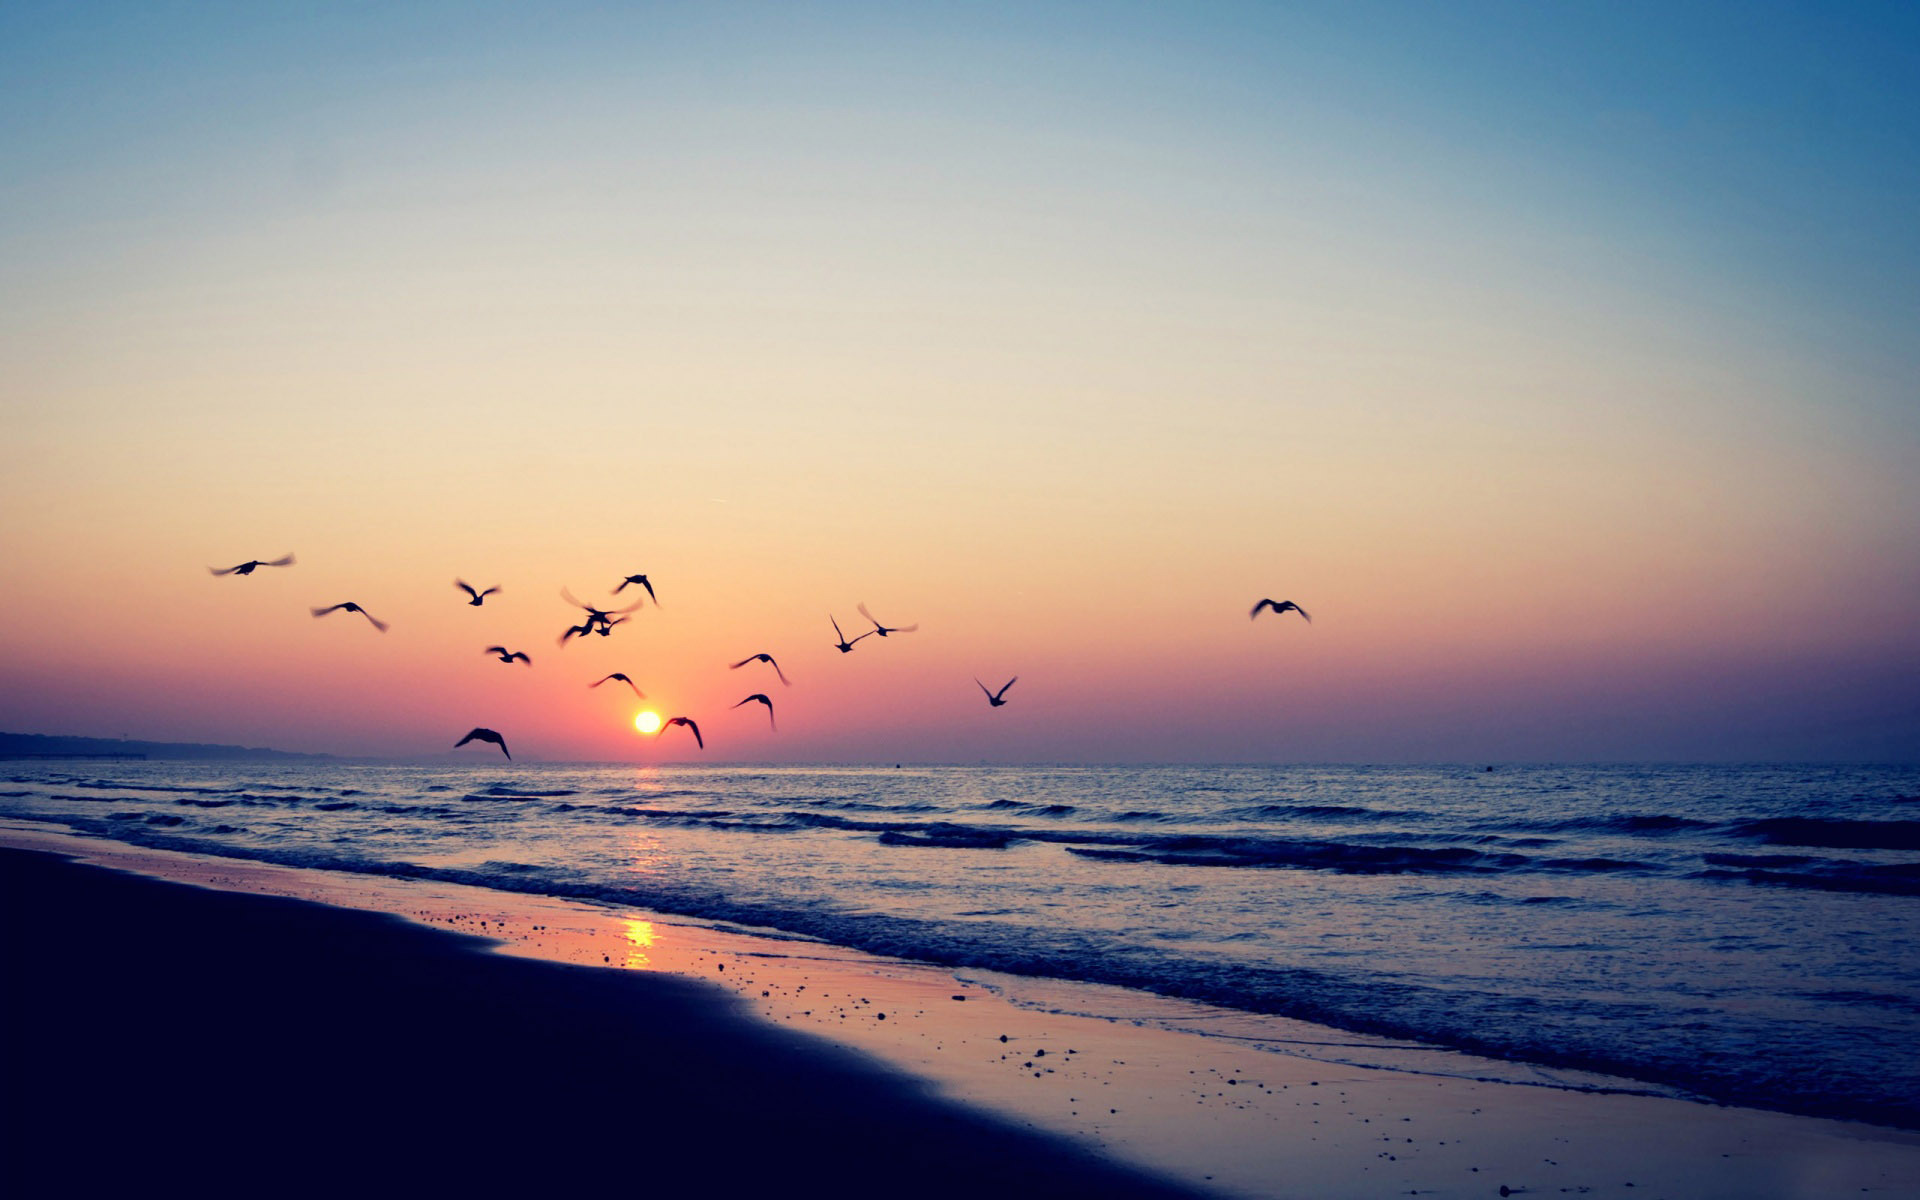 Beautiful Seagulls Wallpaper 30688